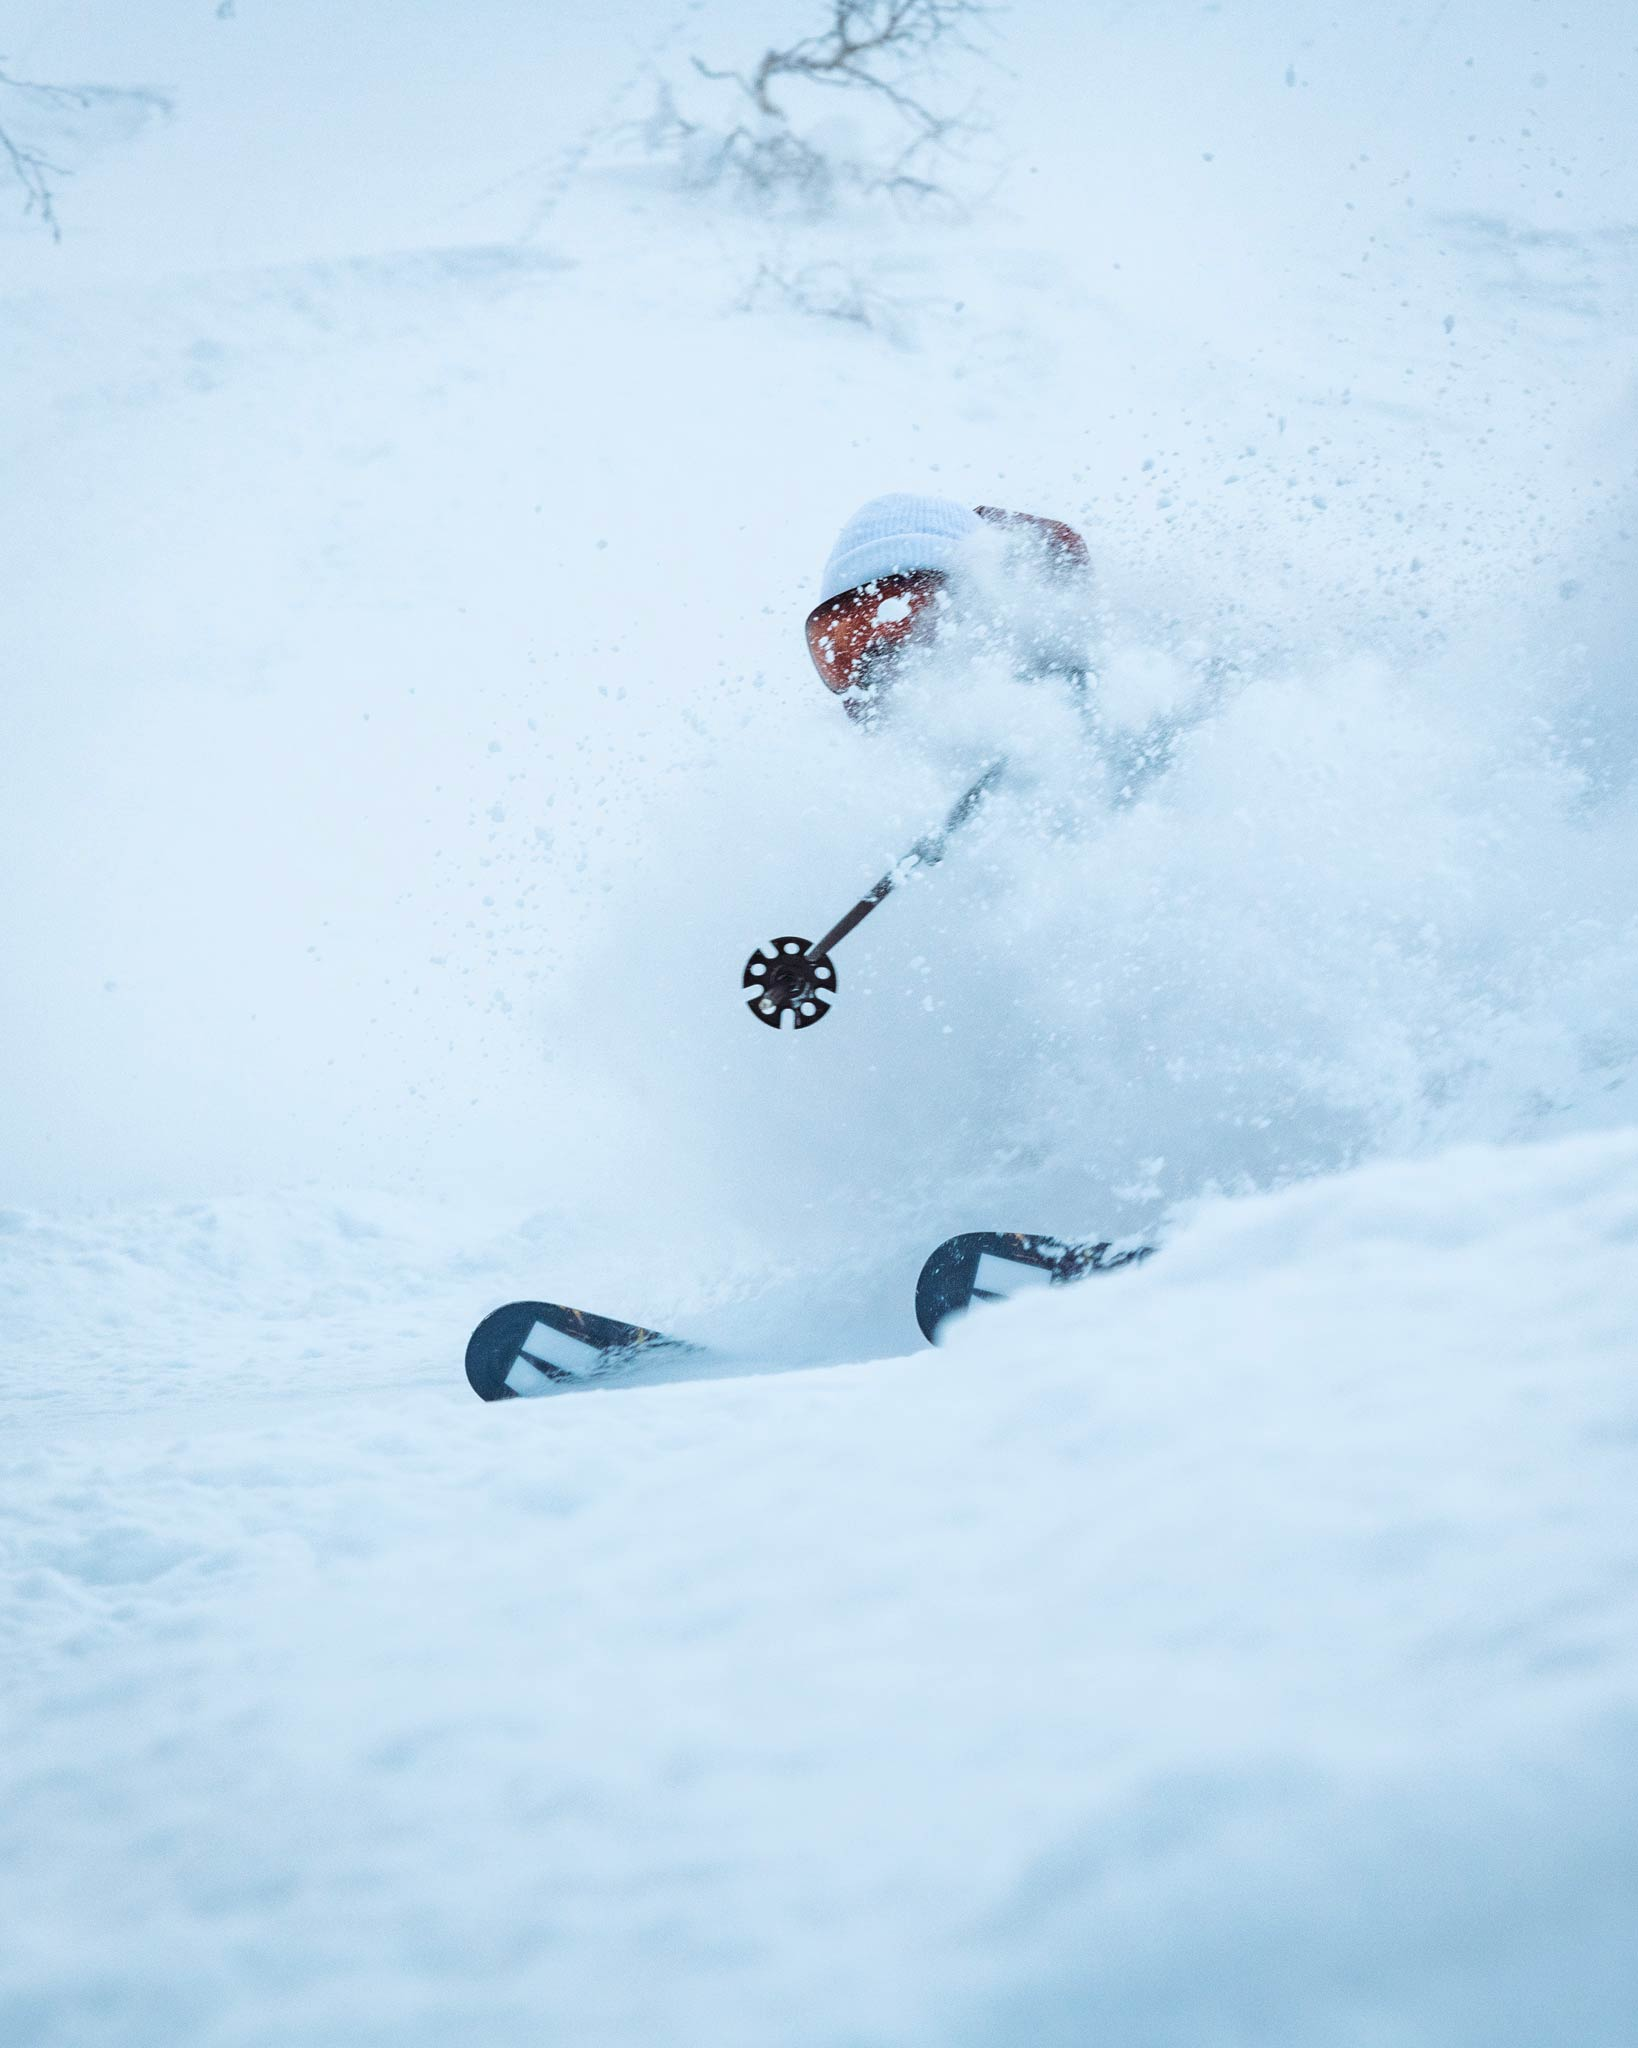 Rider: Josh Absenger - Foto: Matthias Fritzenwallner